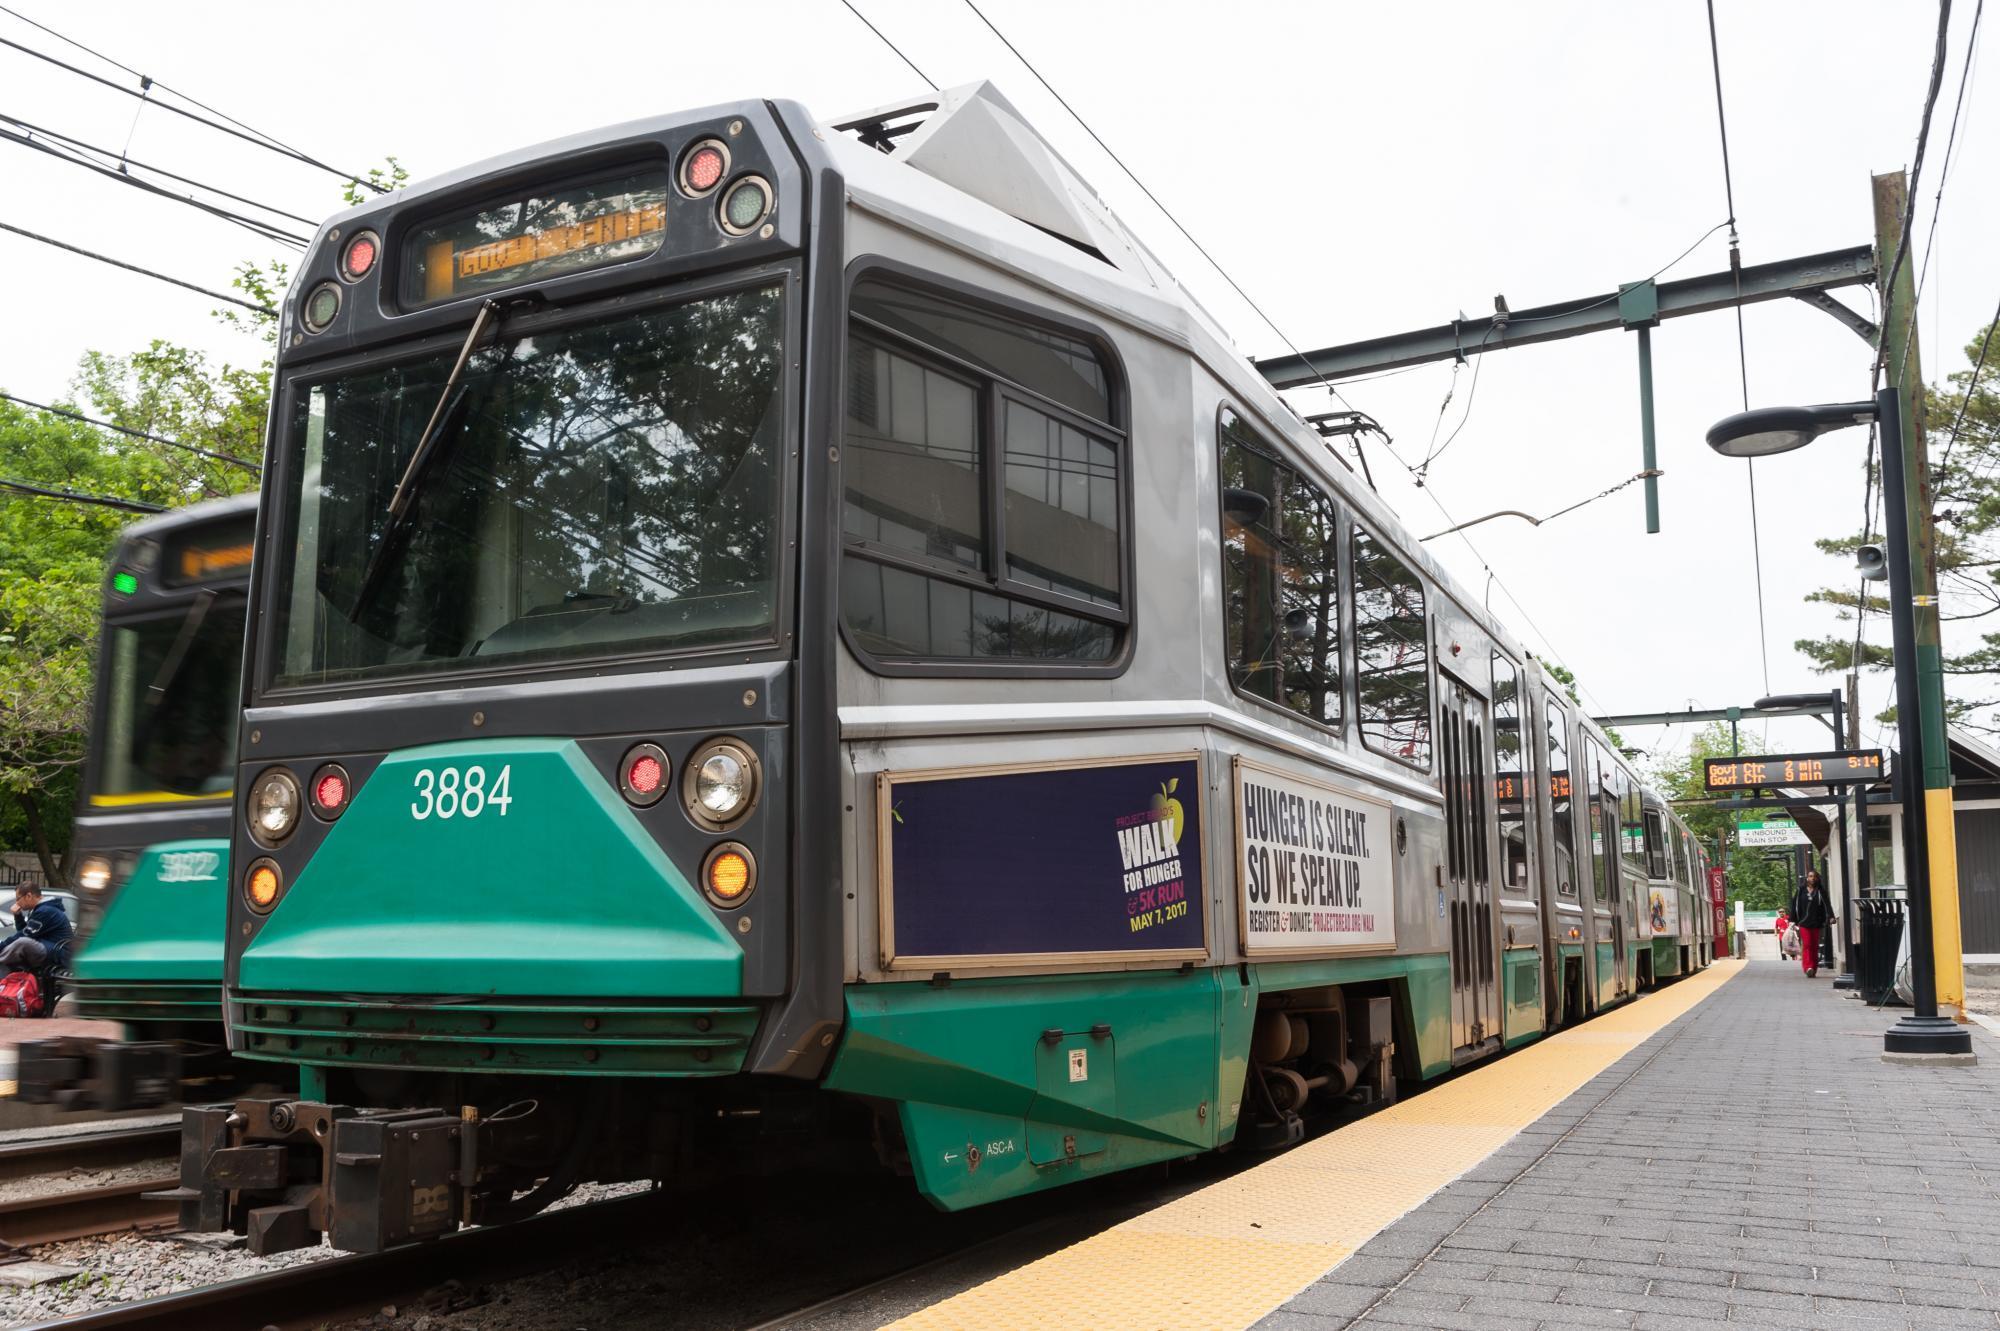 A Green Line train arrives at an above-ground platform.